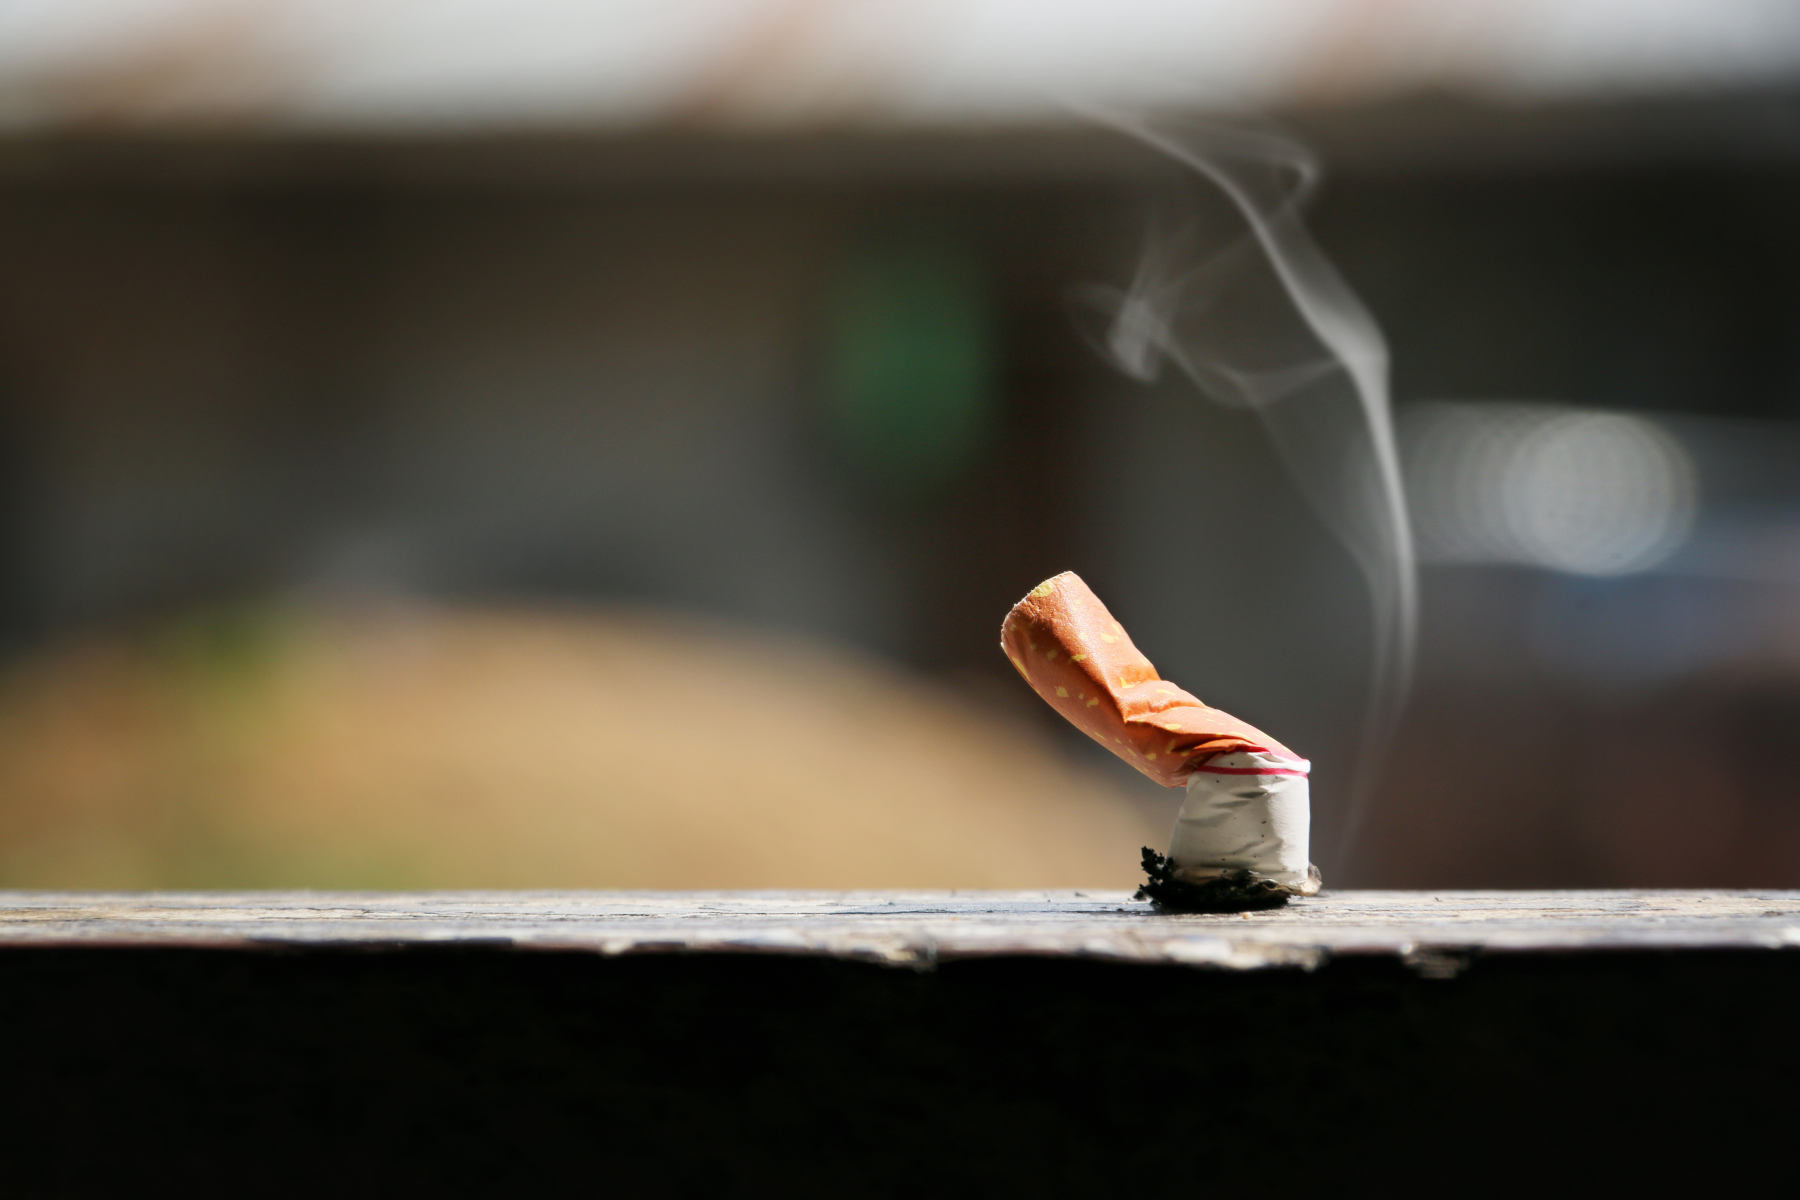 Zigarettenstummel ausgedrückt auf Mauer